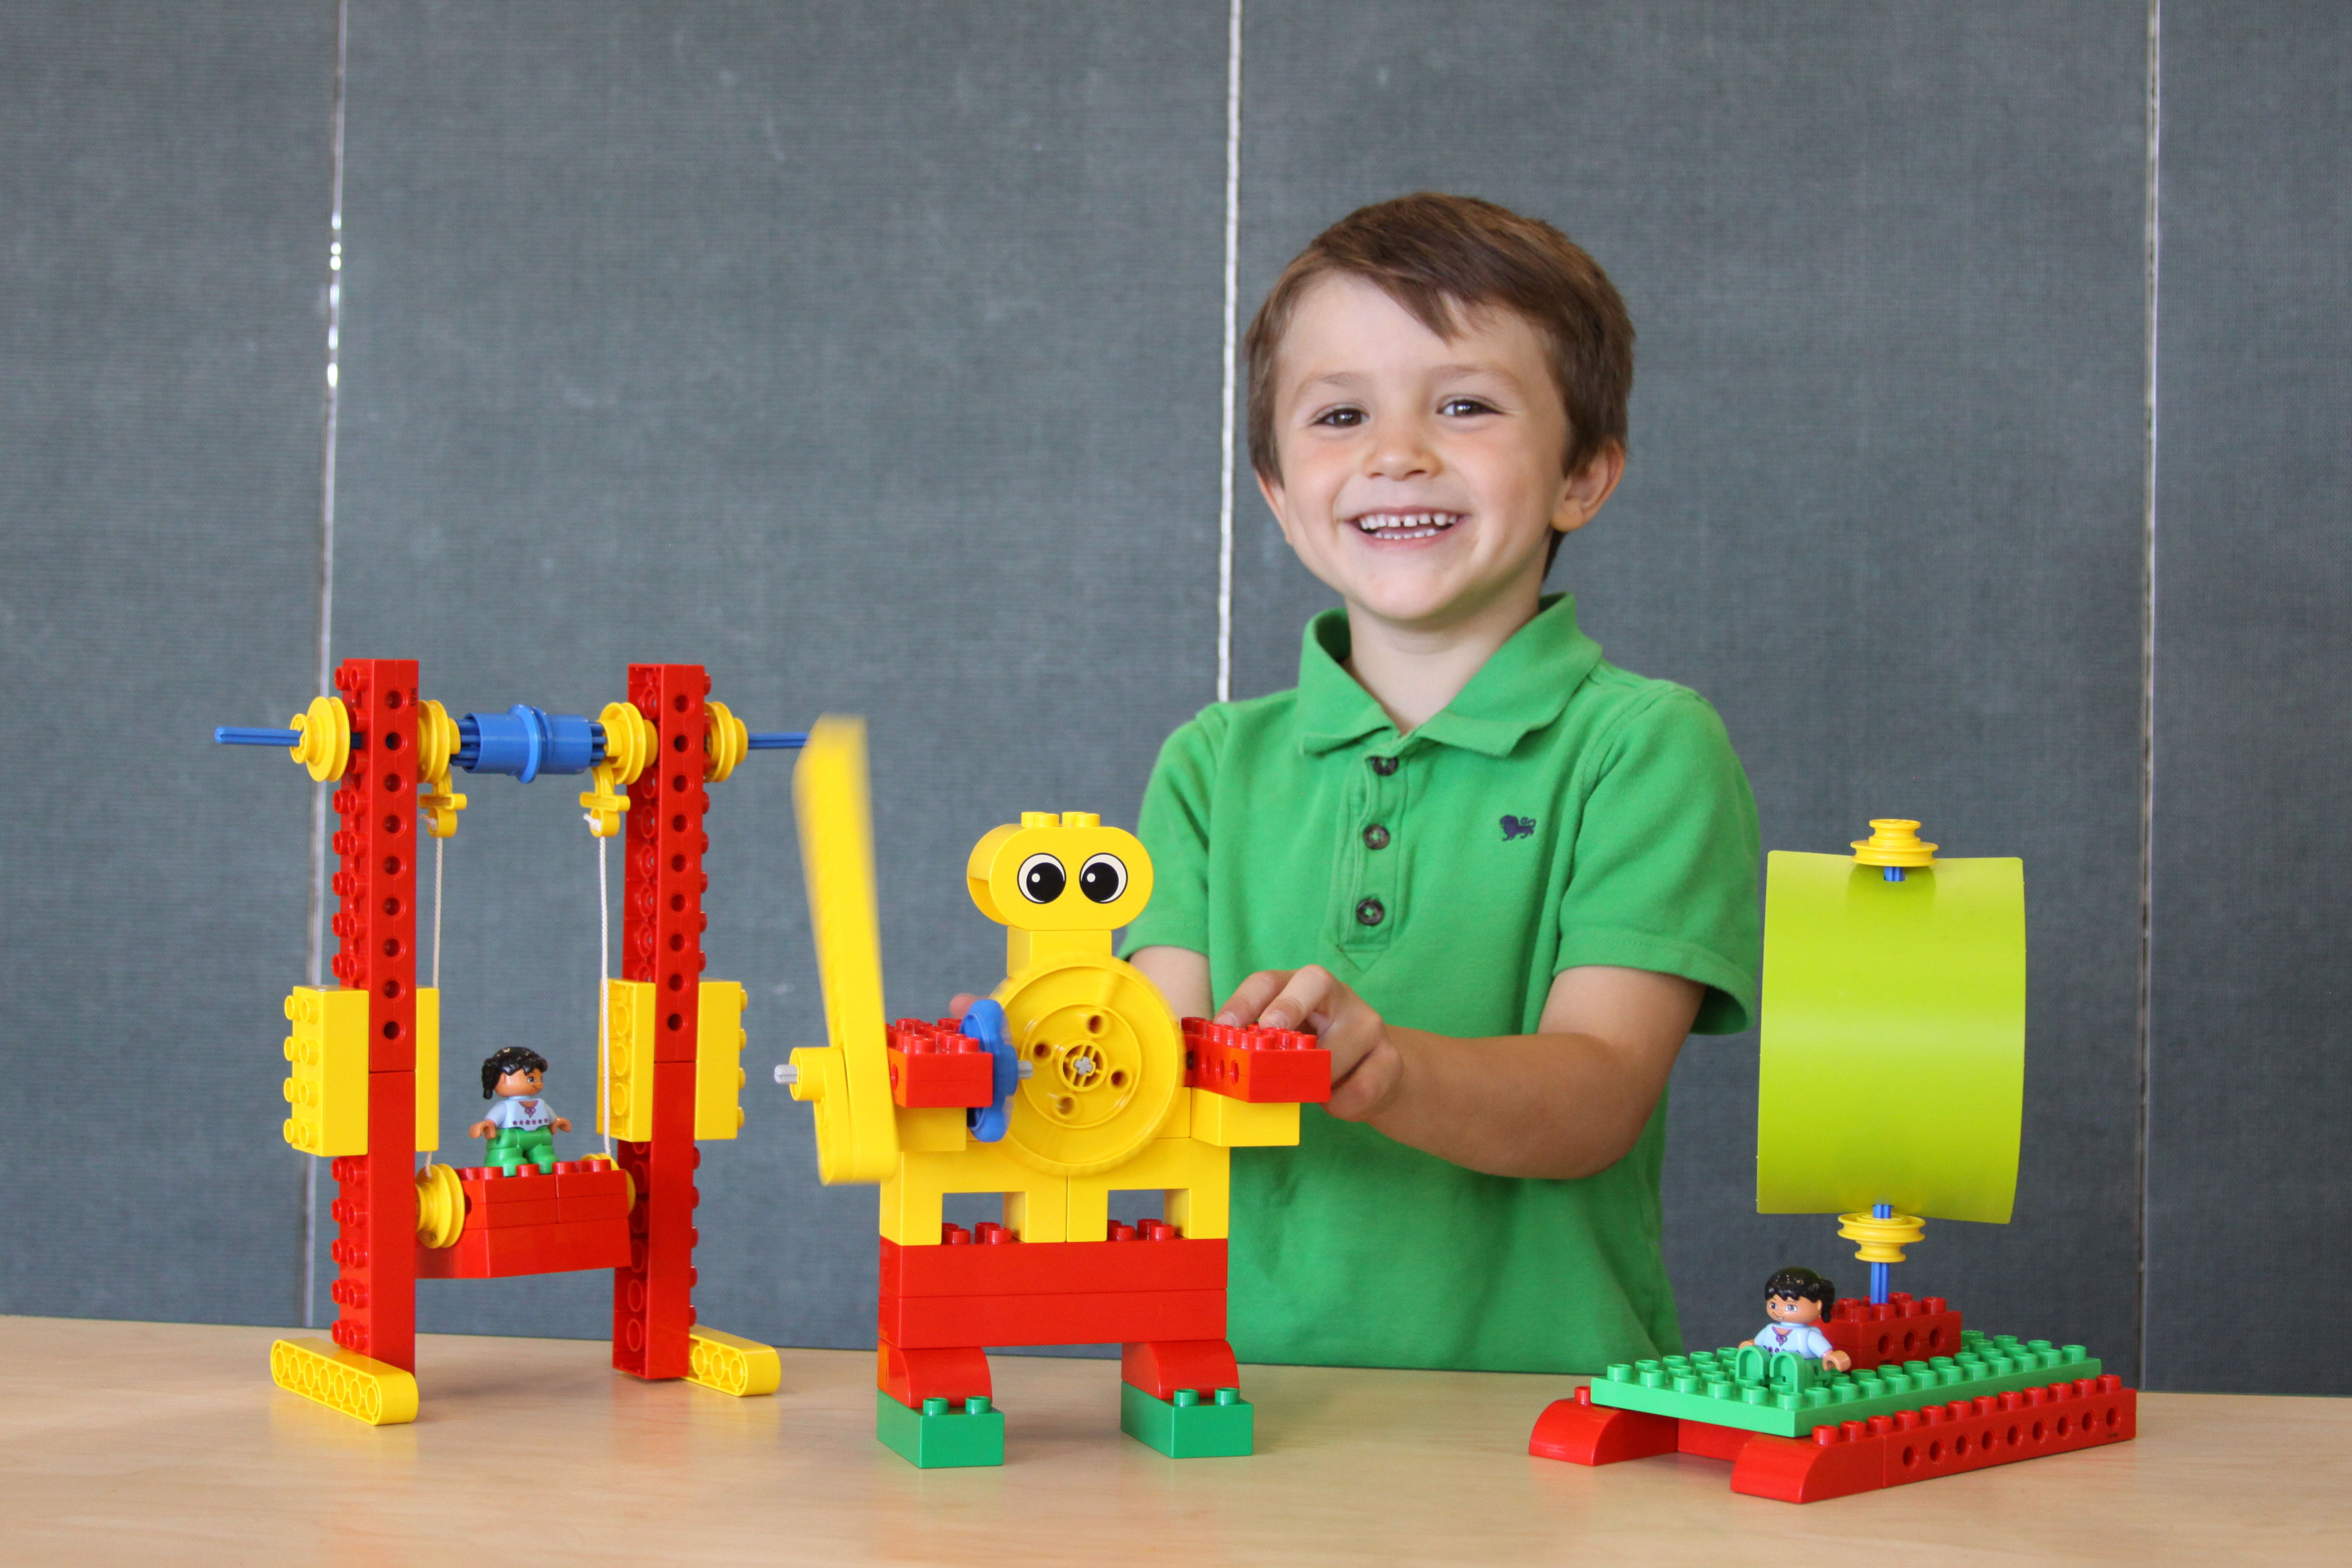 Flagstaff Christian Preschool image 1